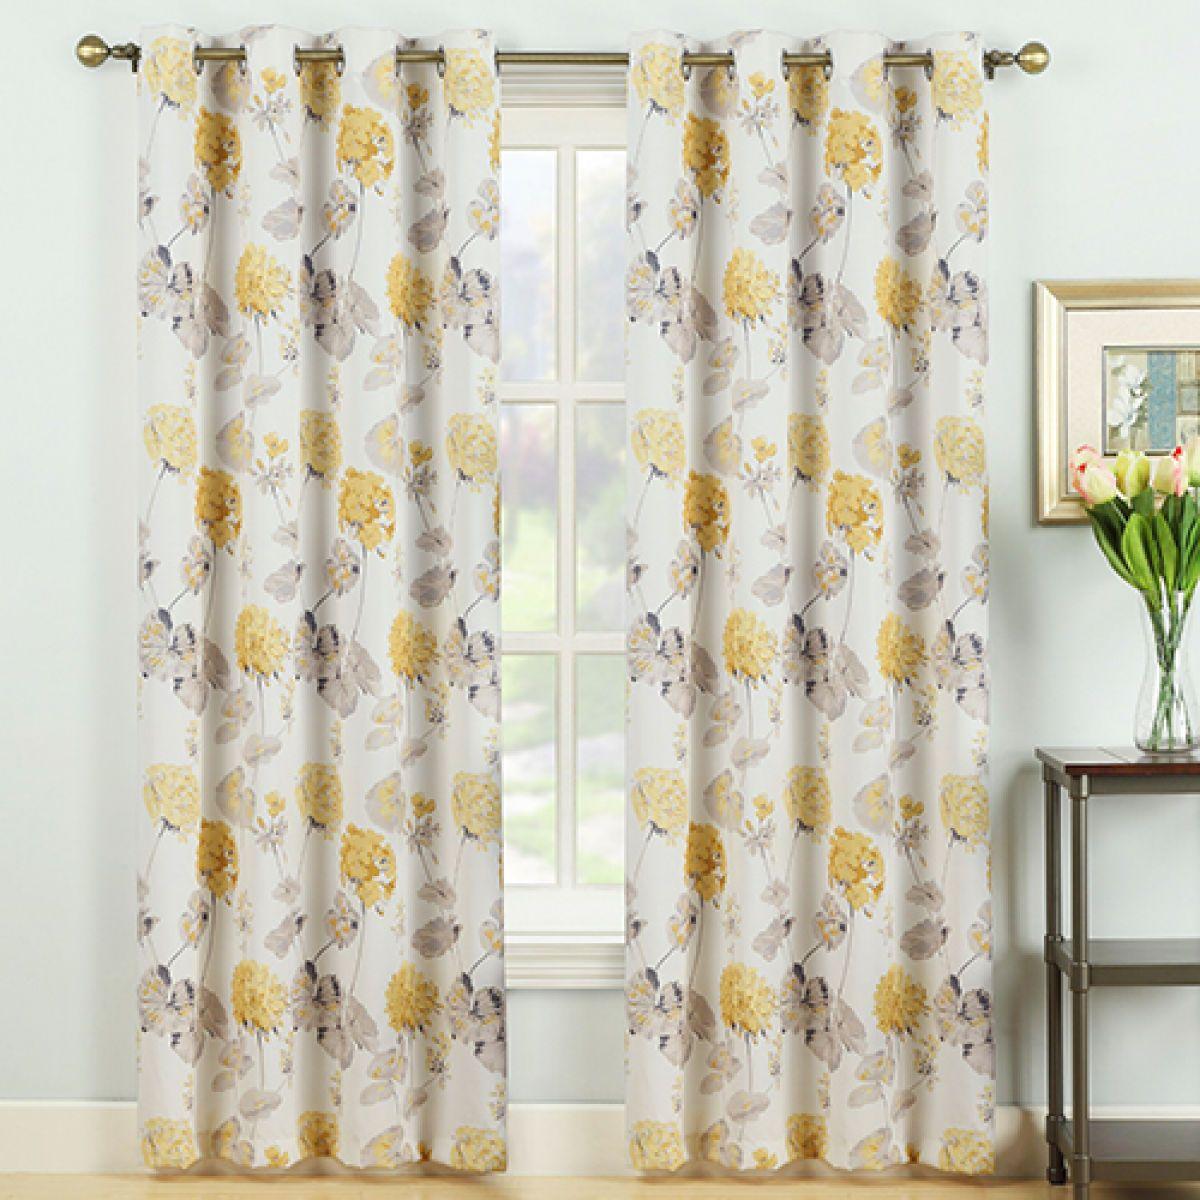 Laura Ashley Geranium Print Grommet Panel Yellow Boscov S Grommet Curtains Panel Curtains Laura Ashley Curtains